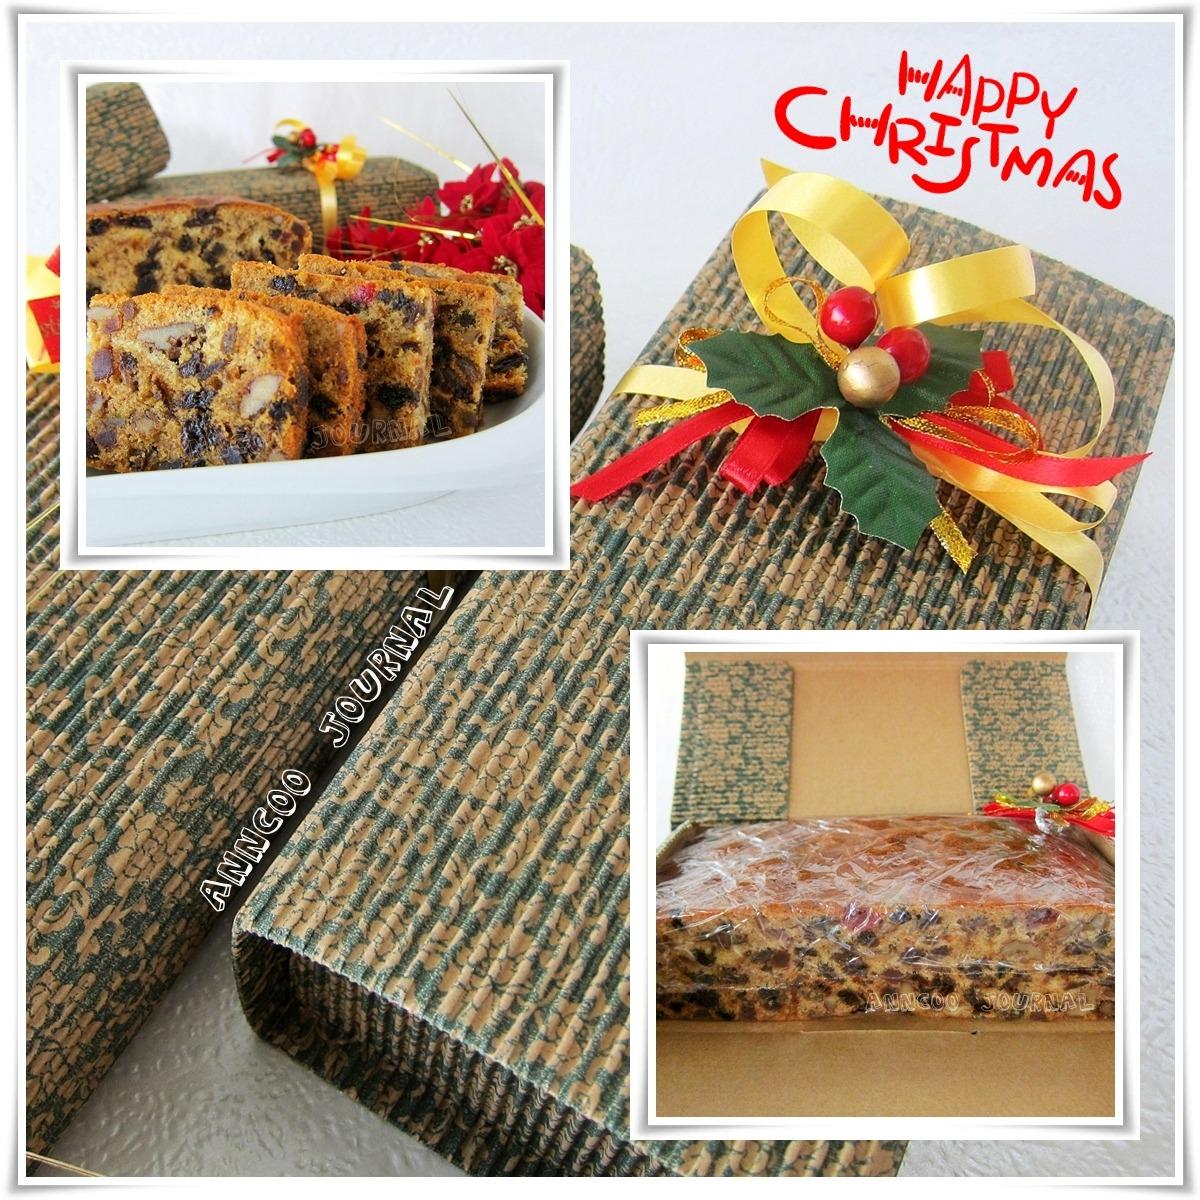 Christmas Fruit Cake 圣诞蛋糕 - Anncoo Journal